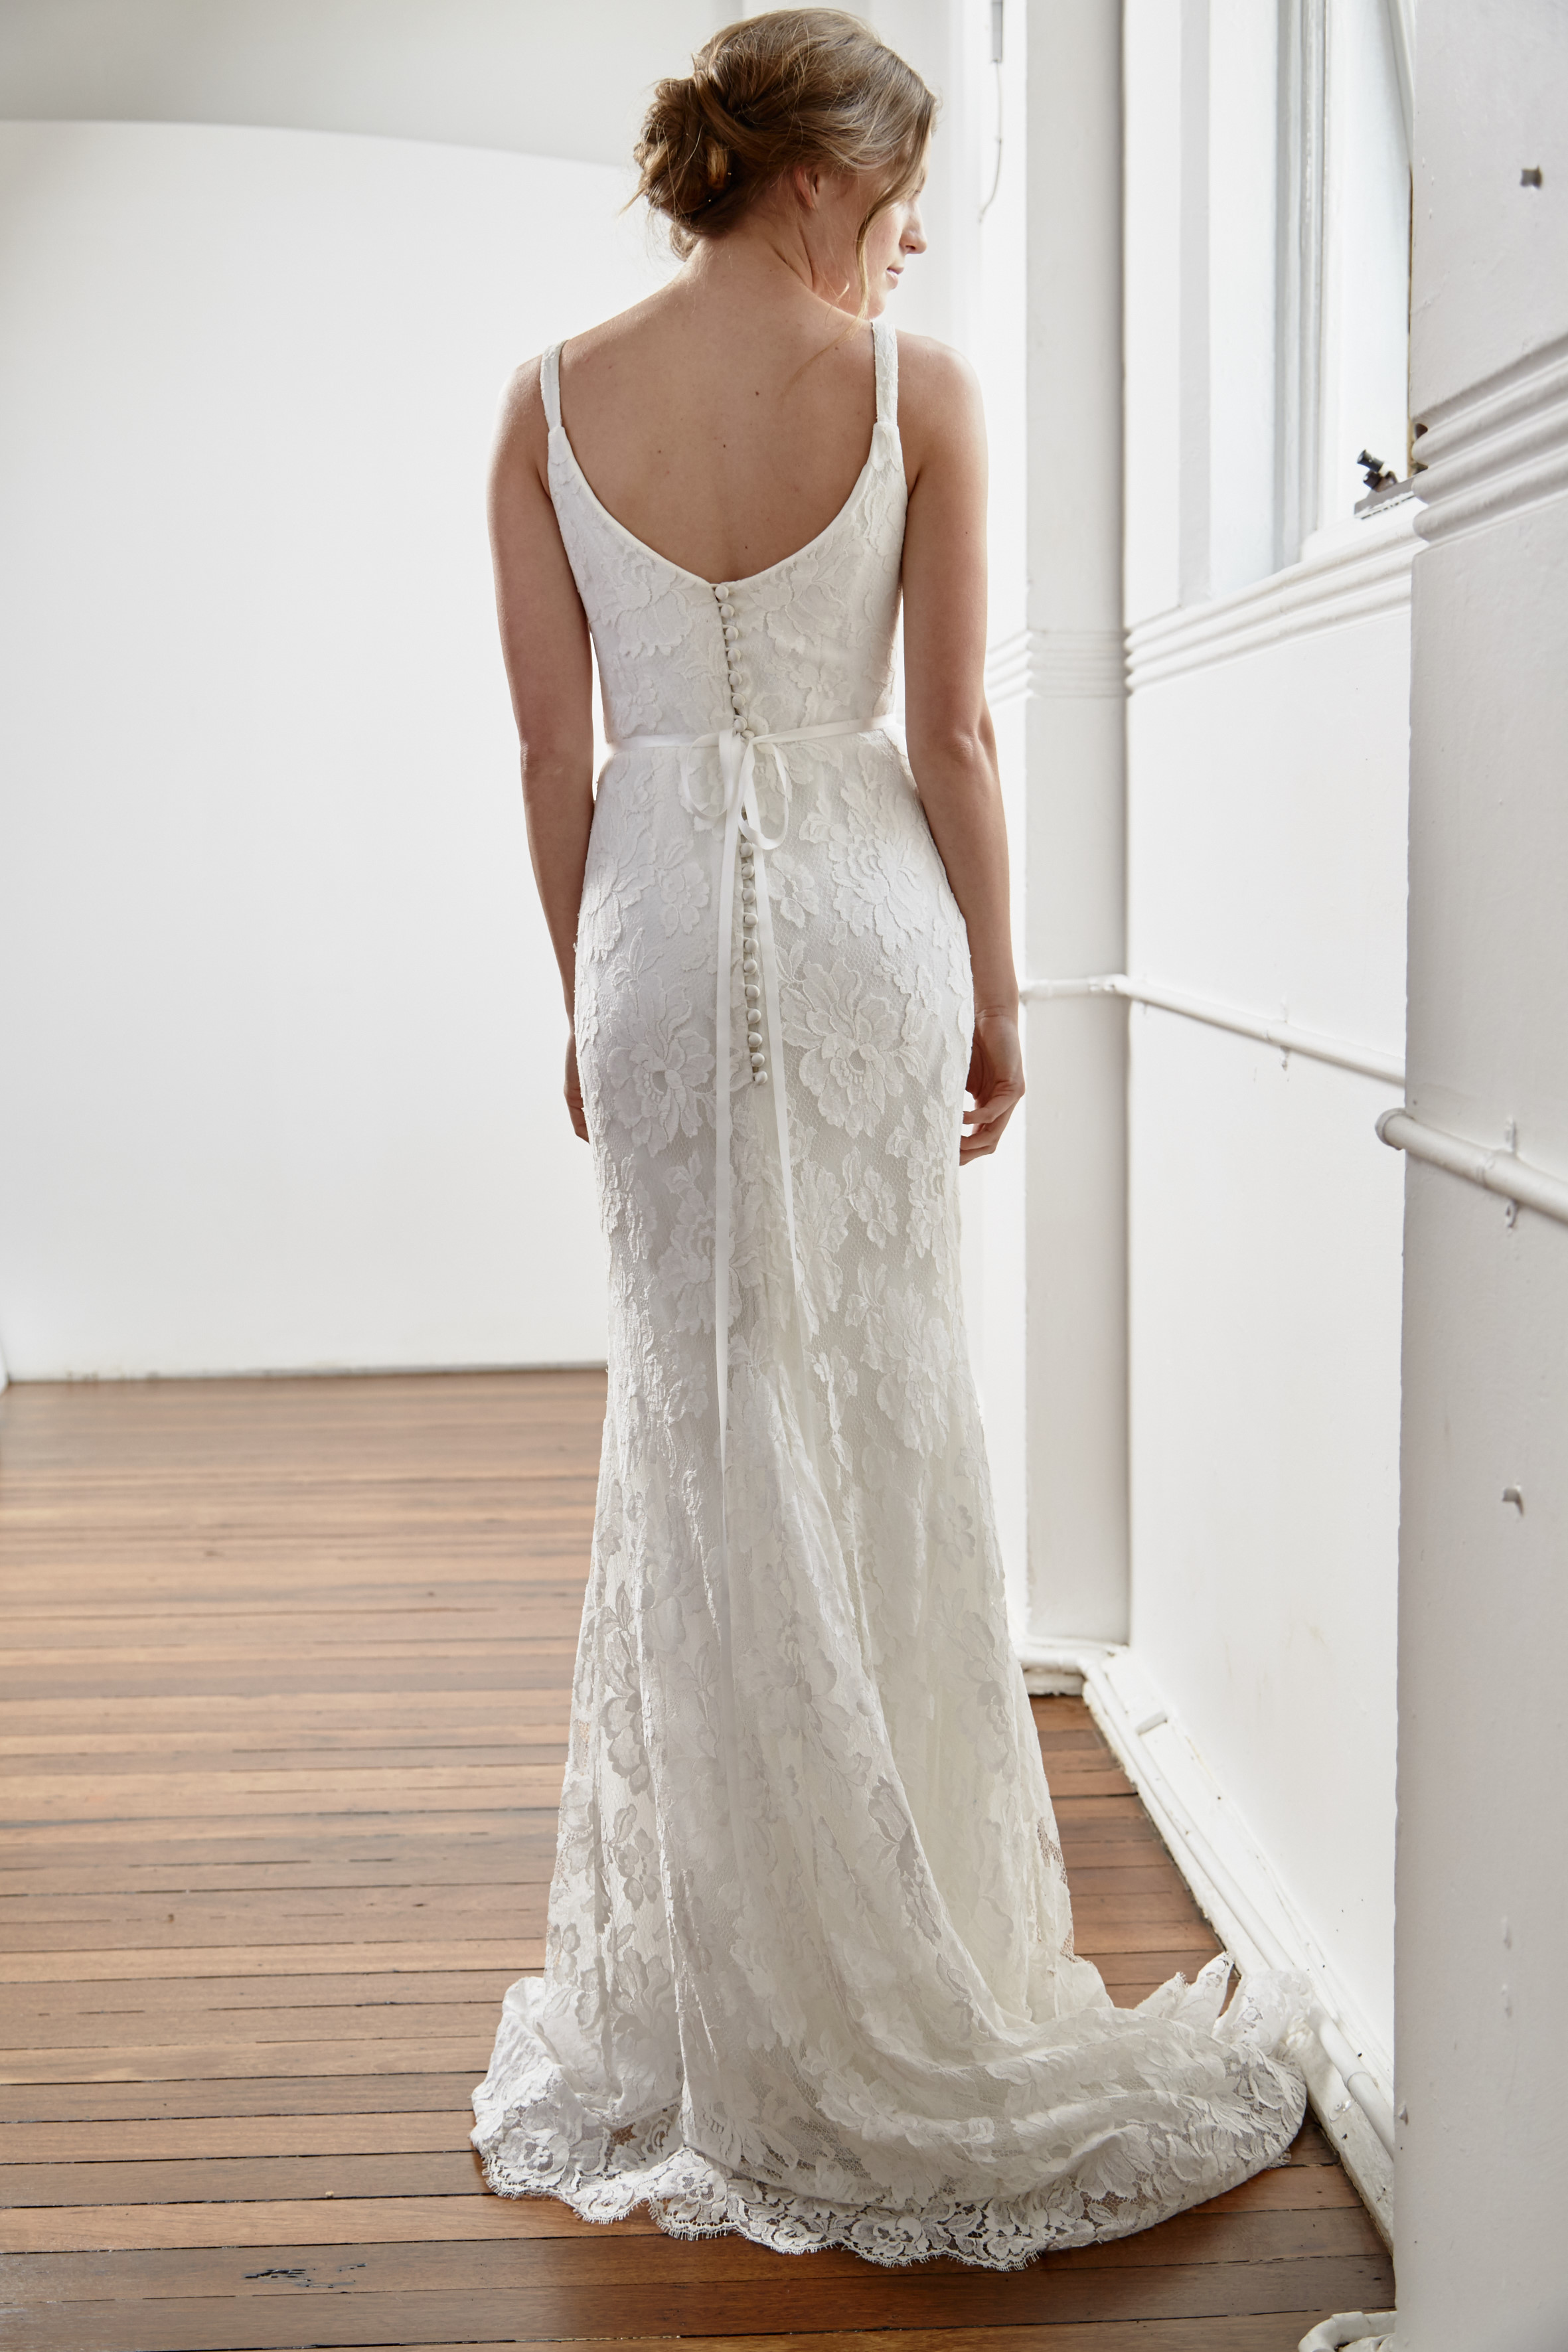 Summer bridal gown Tanya Anic Bridal photographyGrant Sparkes Carroll double bay sydney bridal_036.jpg